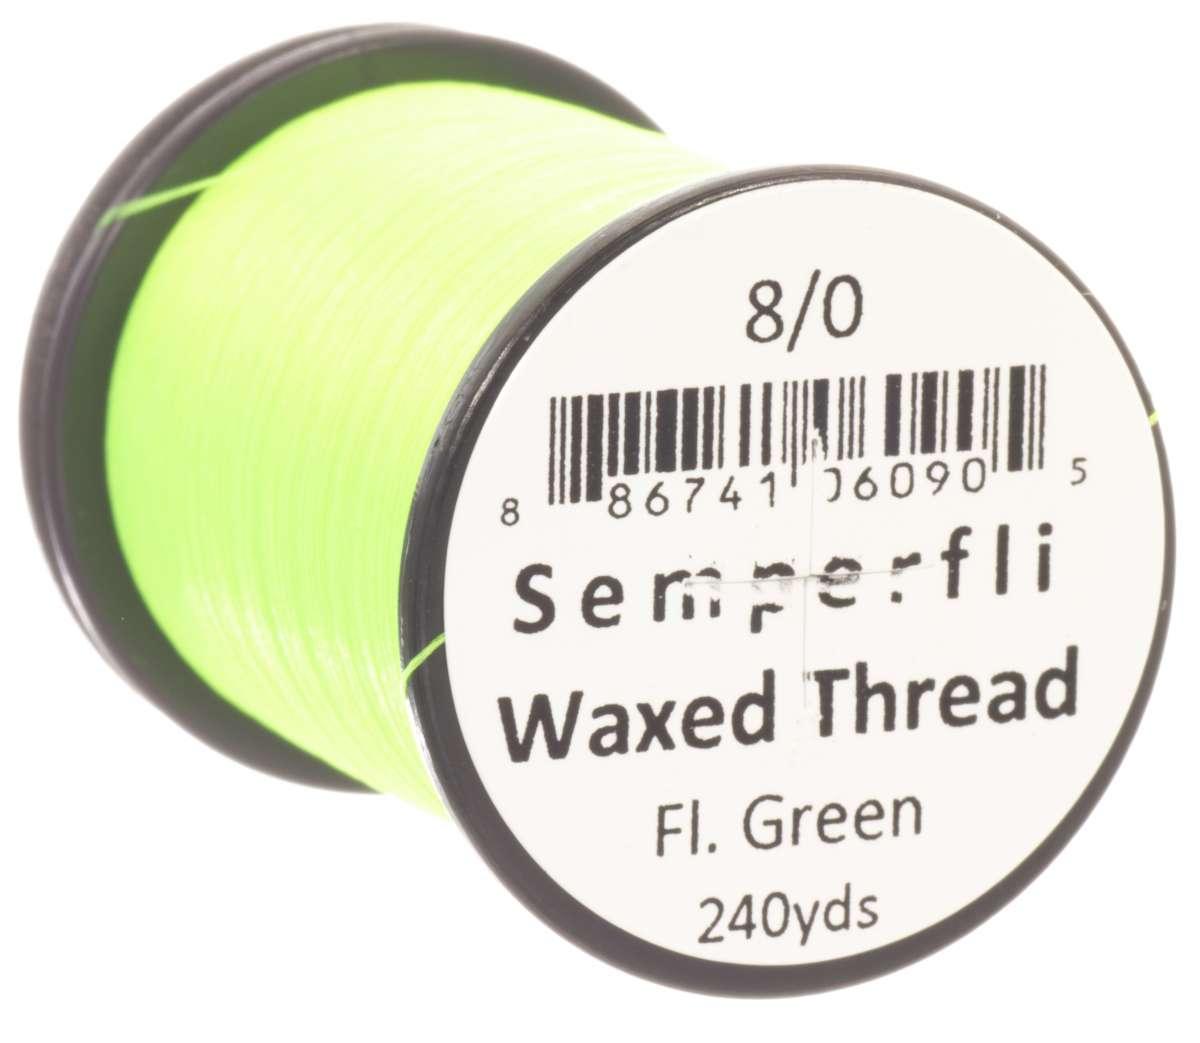 8/0 Classic Waxed Fluoro Green Sem-0400-1838